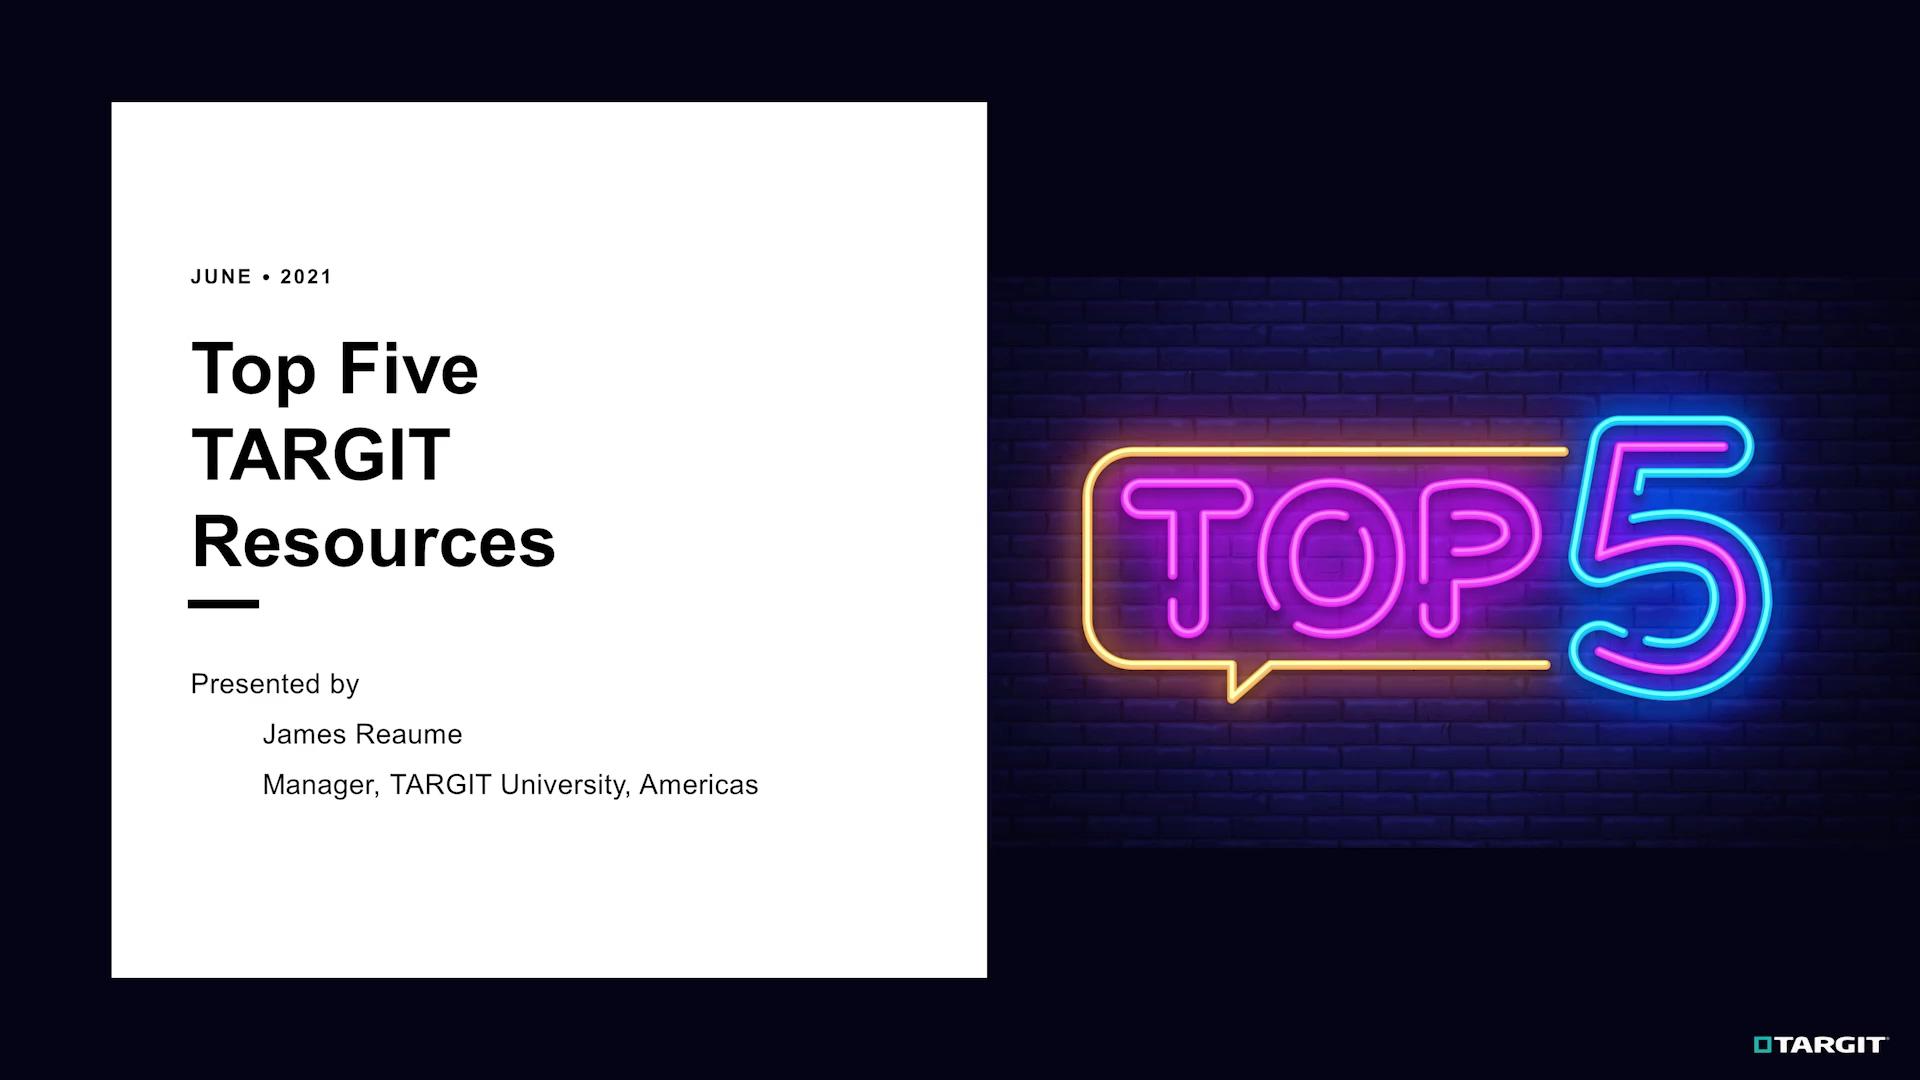 Top5 TARGIT Resources.mp4